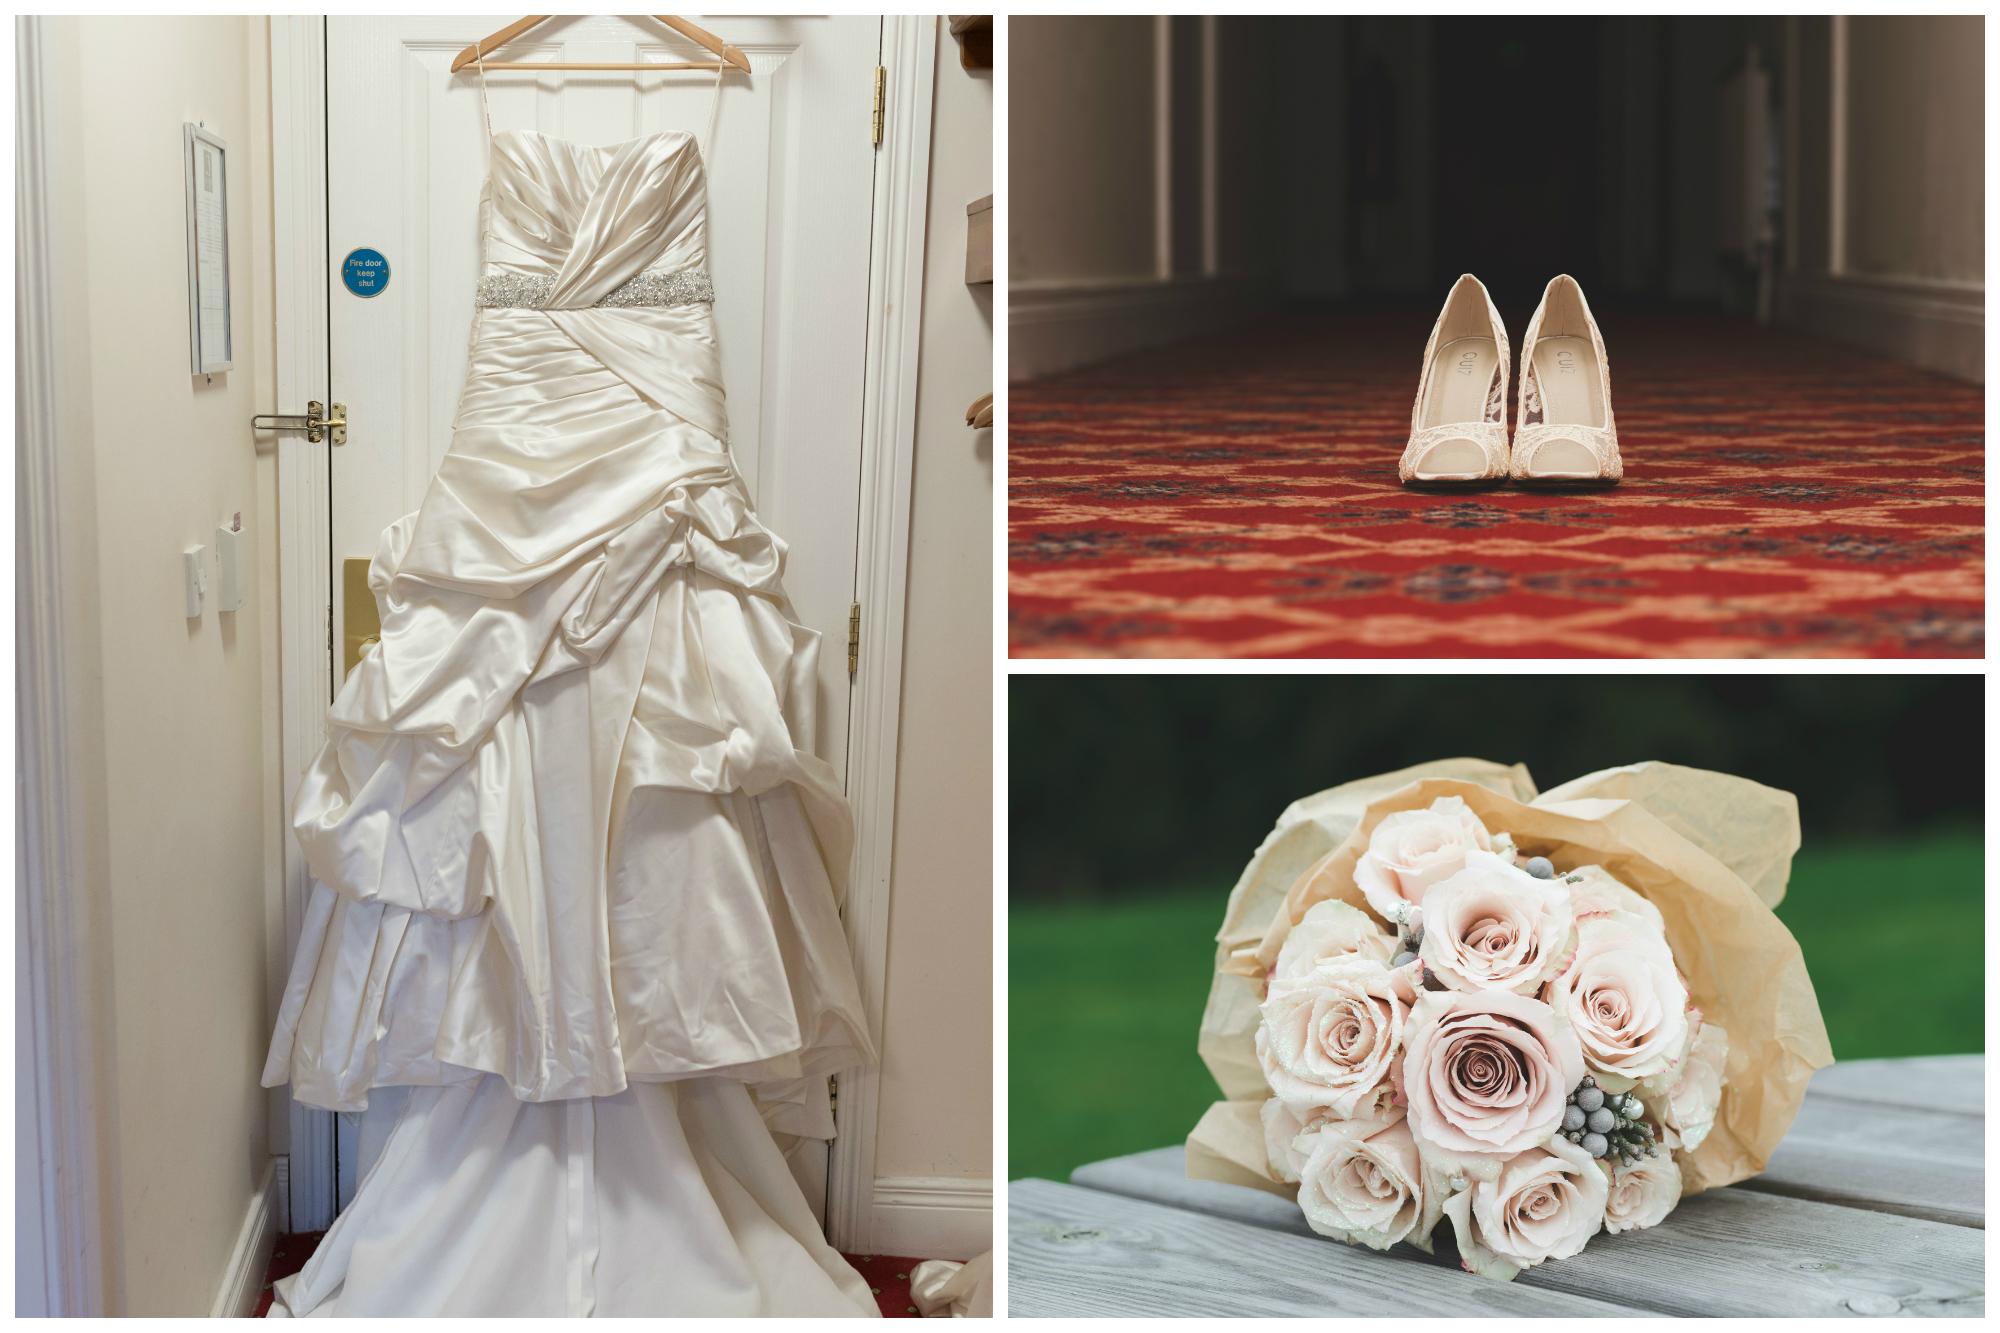 Northern_Ireland_Wedding_Photographer_Purephotoni_Dunsilly_Hotel_Dress_Shoes_Rings.jpg